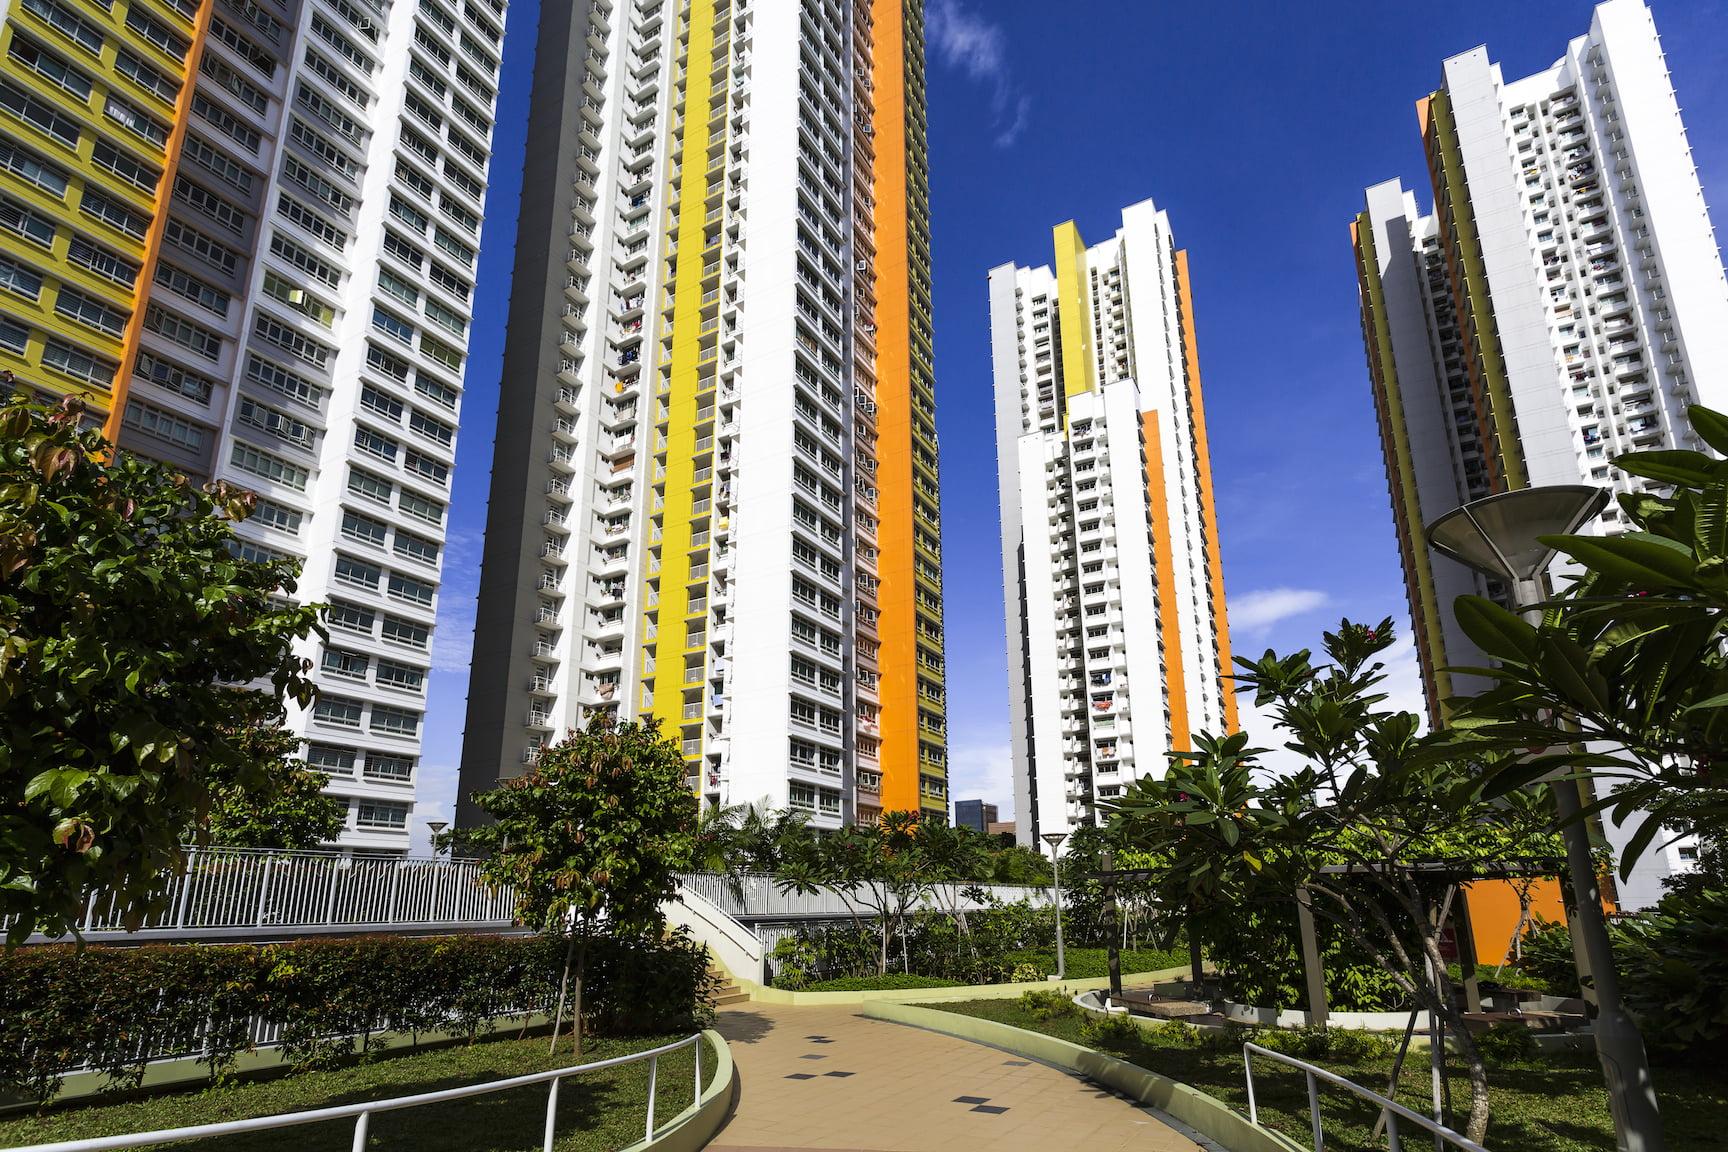 Reasons for choosing a new HDB flat over an old HDB flat 1